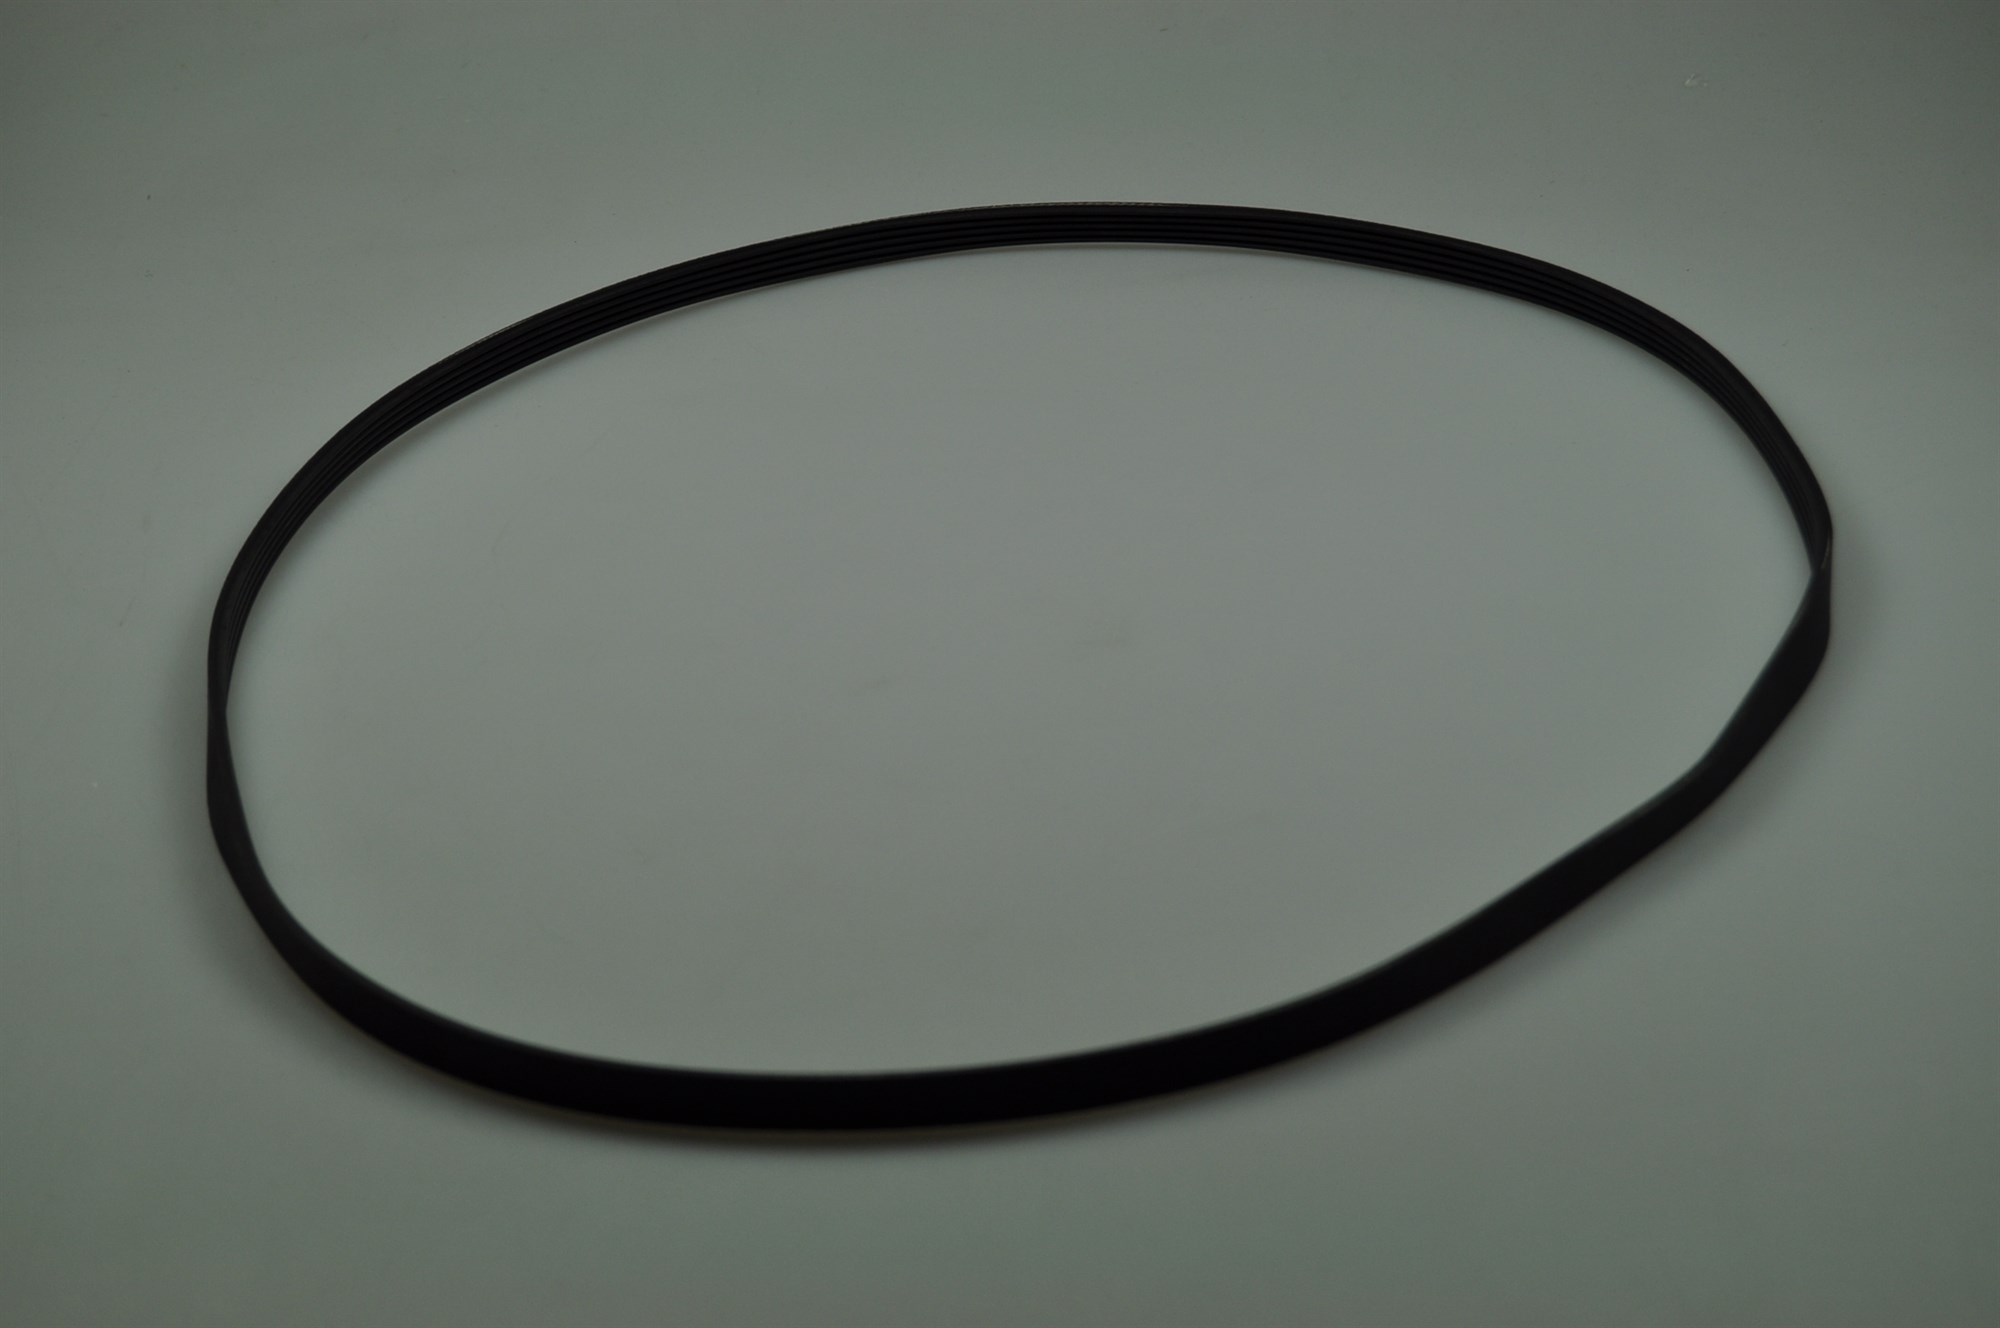 courroie whirlpool lave linge 1314 1316 j4. Black Bedroom Furniture Sets. Home Design Ideas